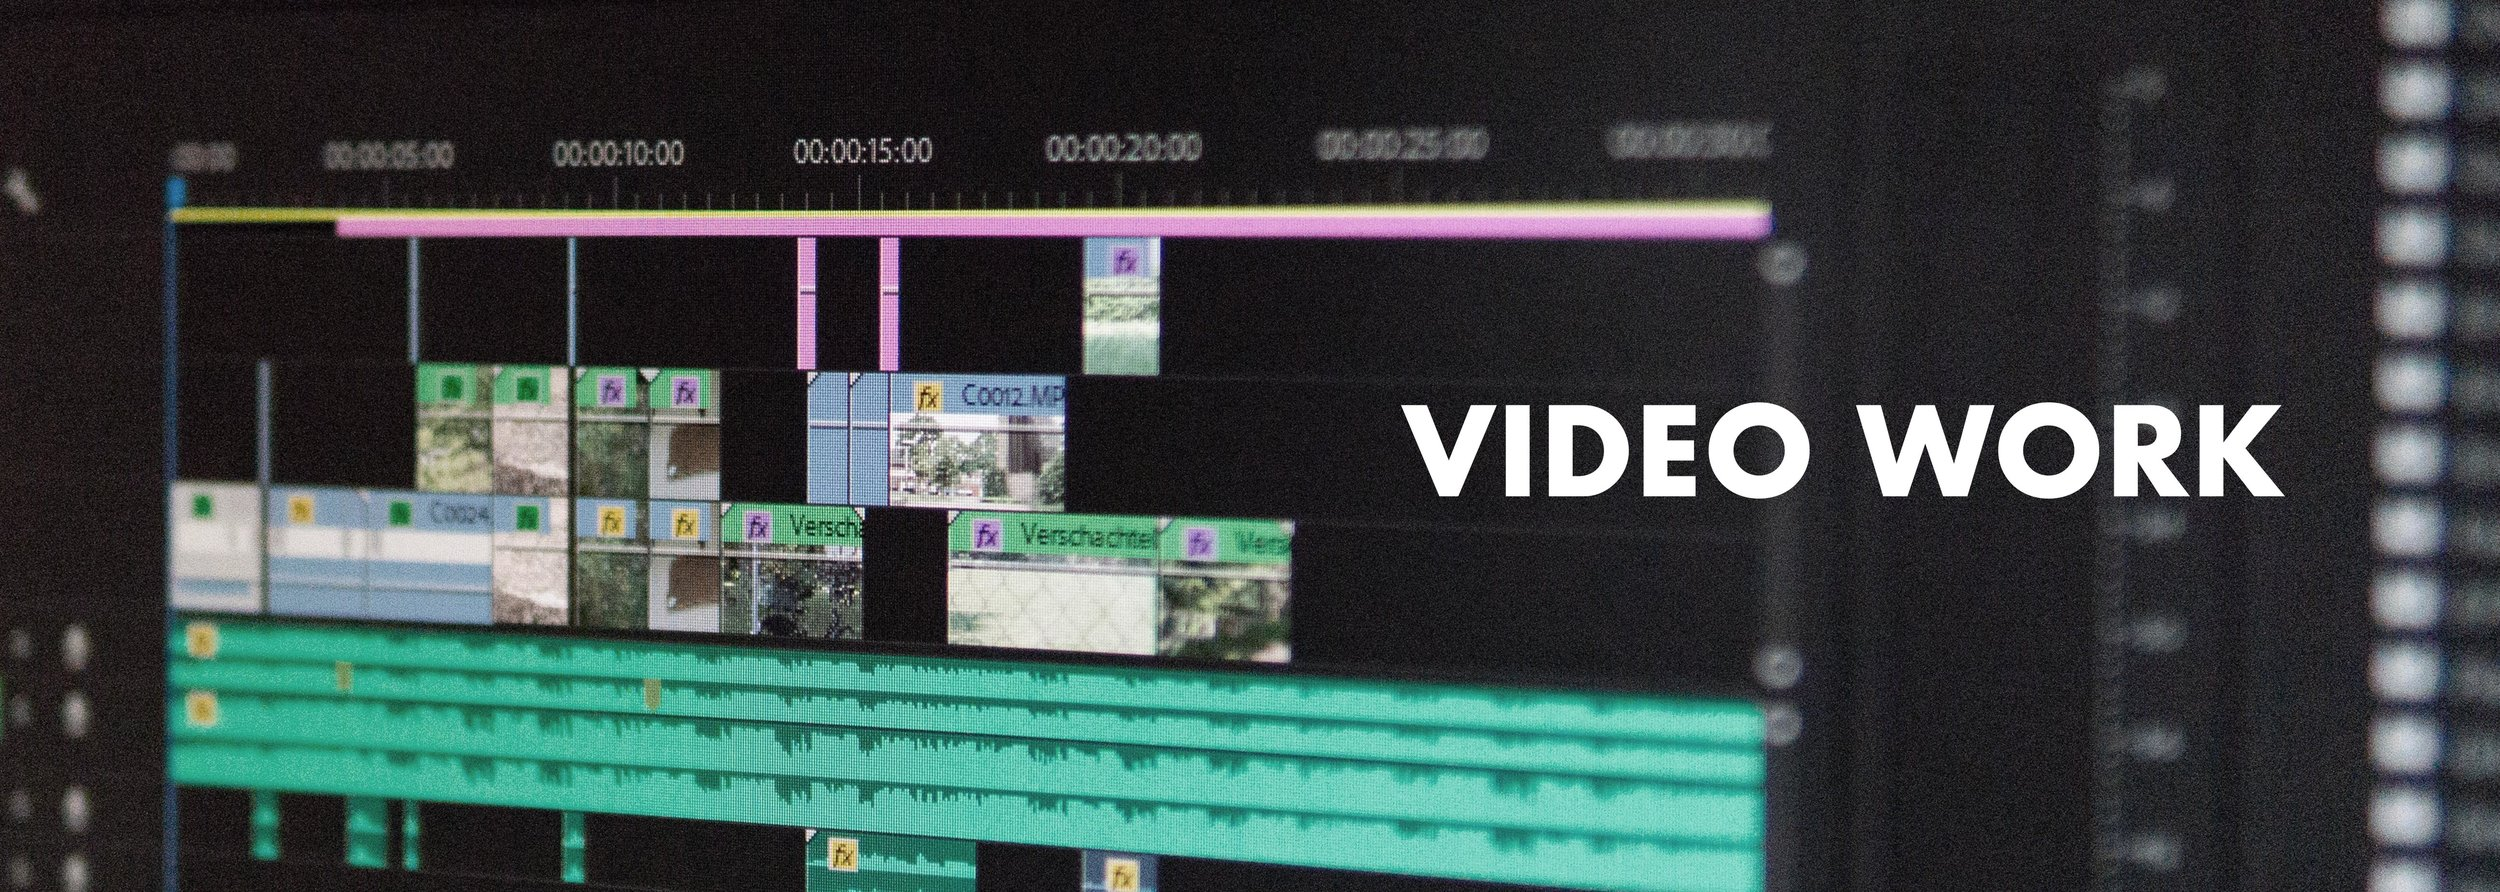 Video Work.jpg